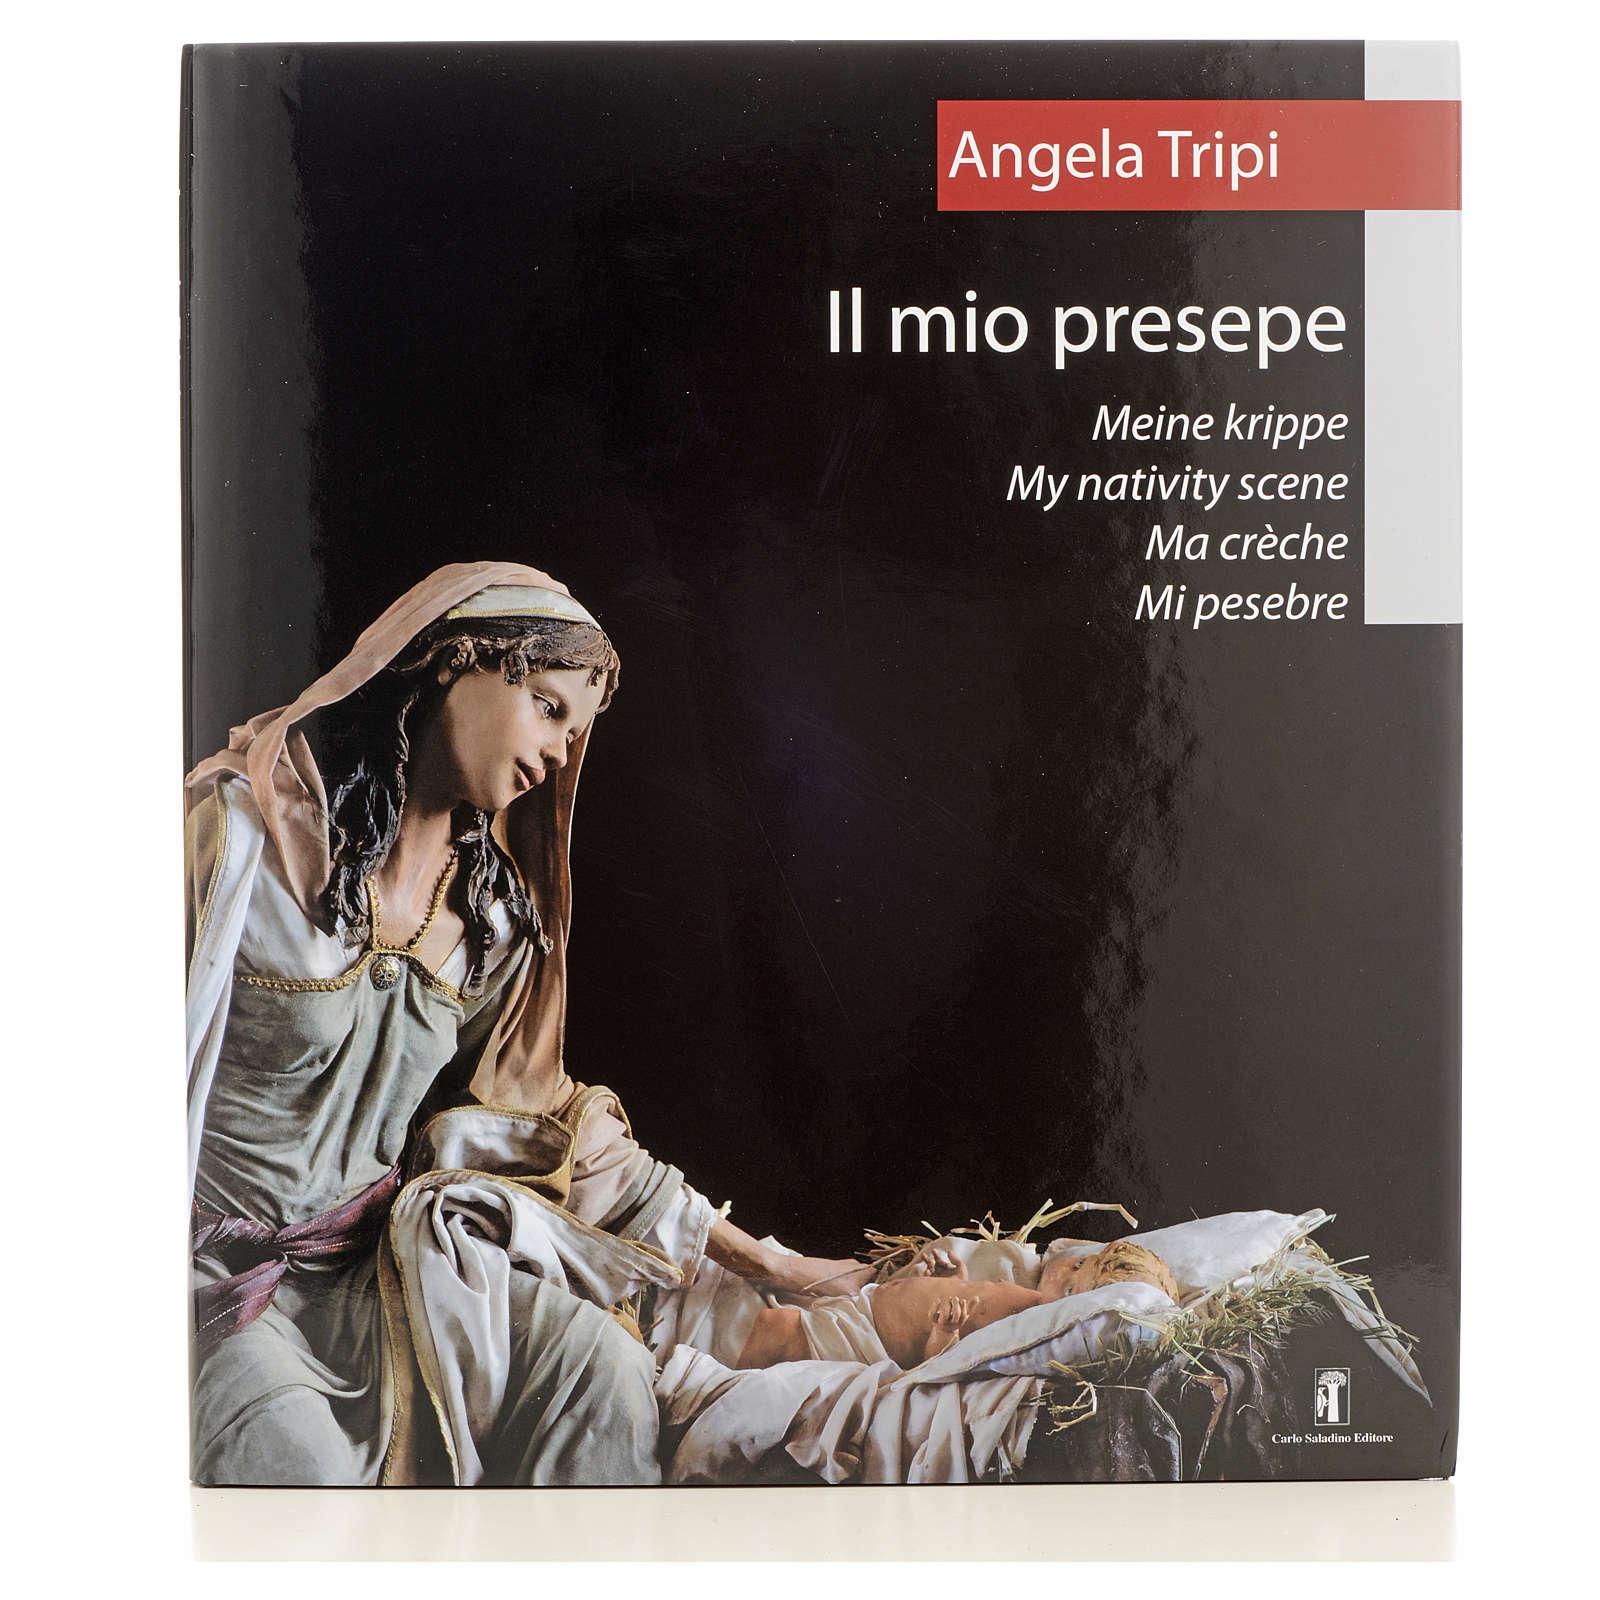 Angela Tripi - Il mio presepe 4